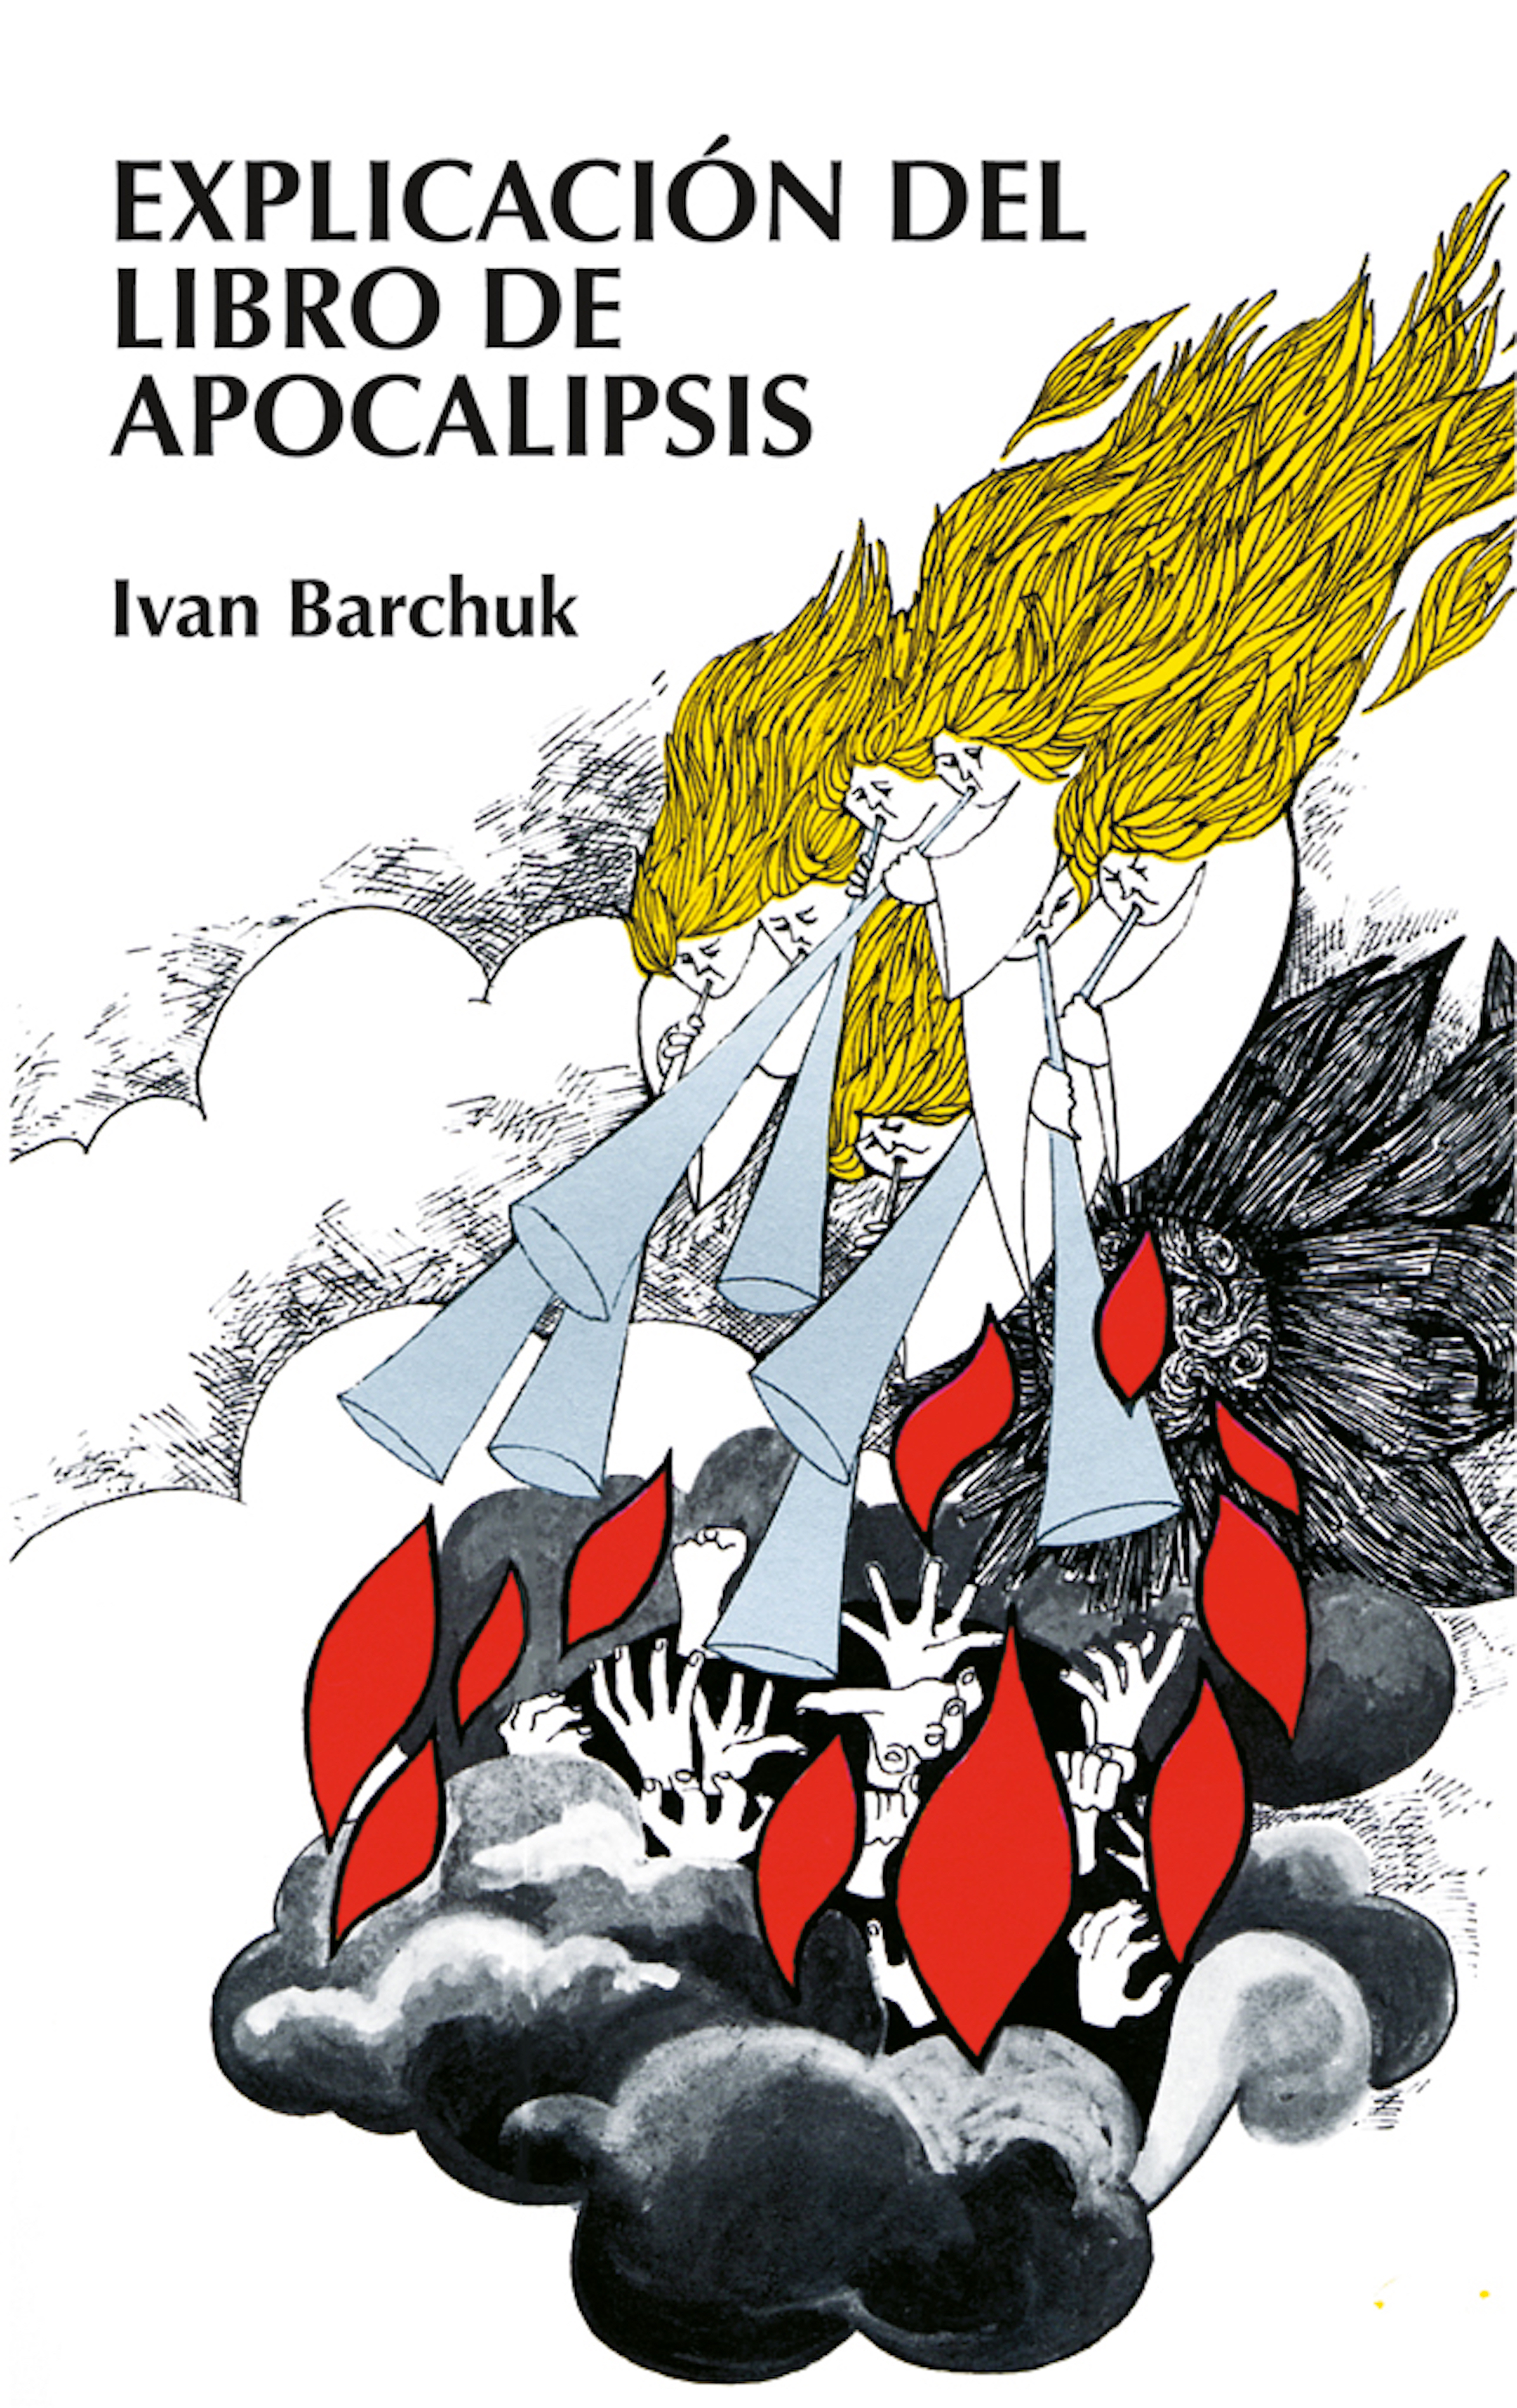 цена Ivan Barchuk Explicación del libro de Apocalipsis онлайн в 2017 году